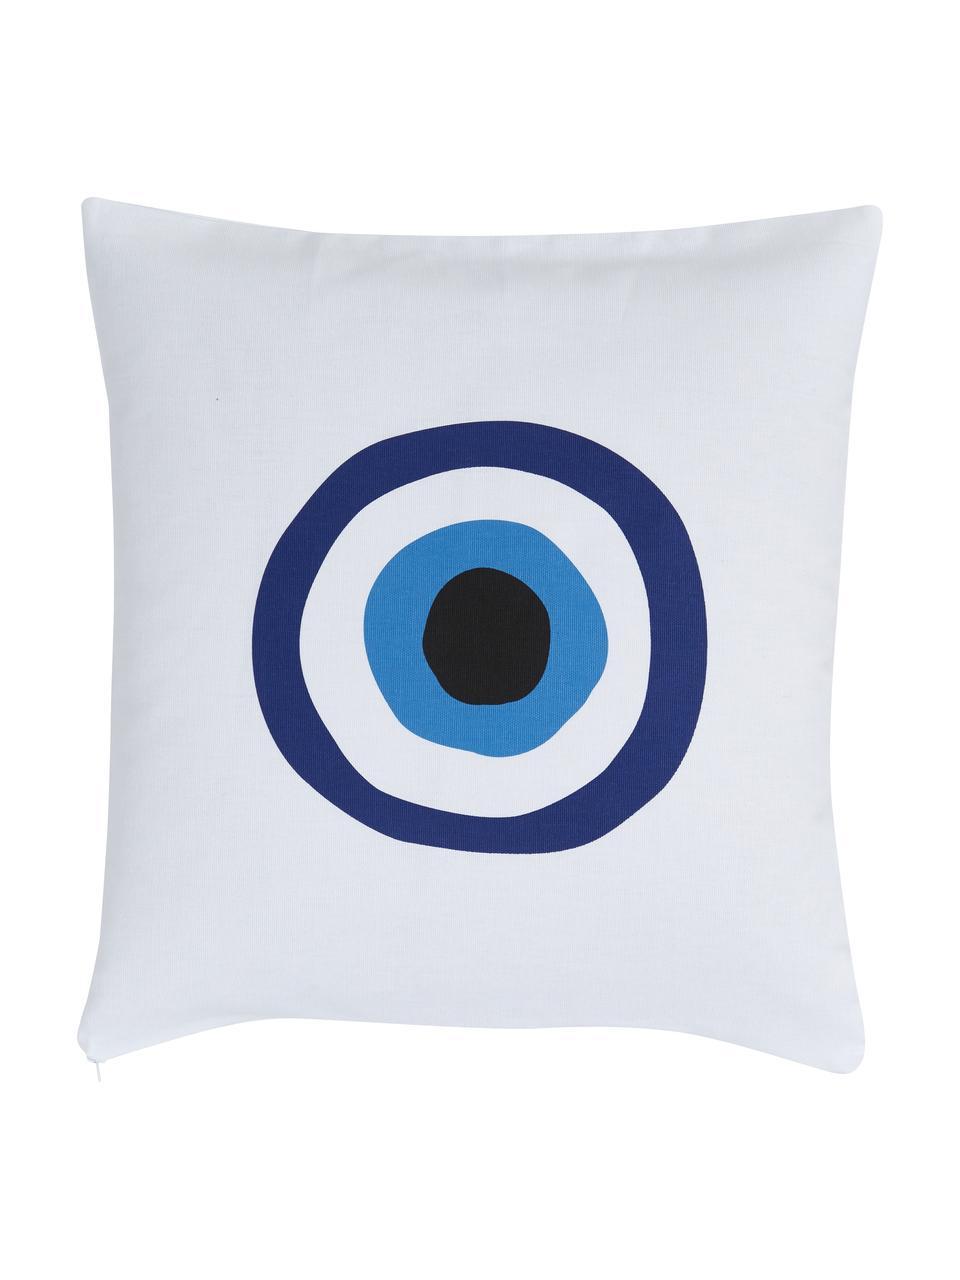 Kissenhülle Nazar in Blau/Weiß, 100% Baumwolle, Blau,Schwarz, 40 x 40 cm